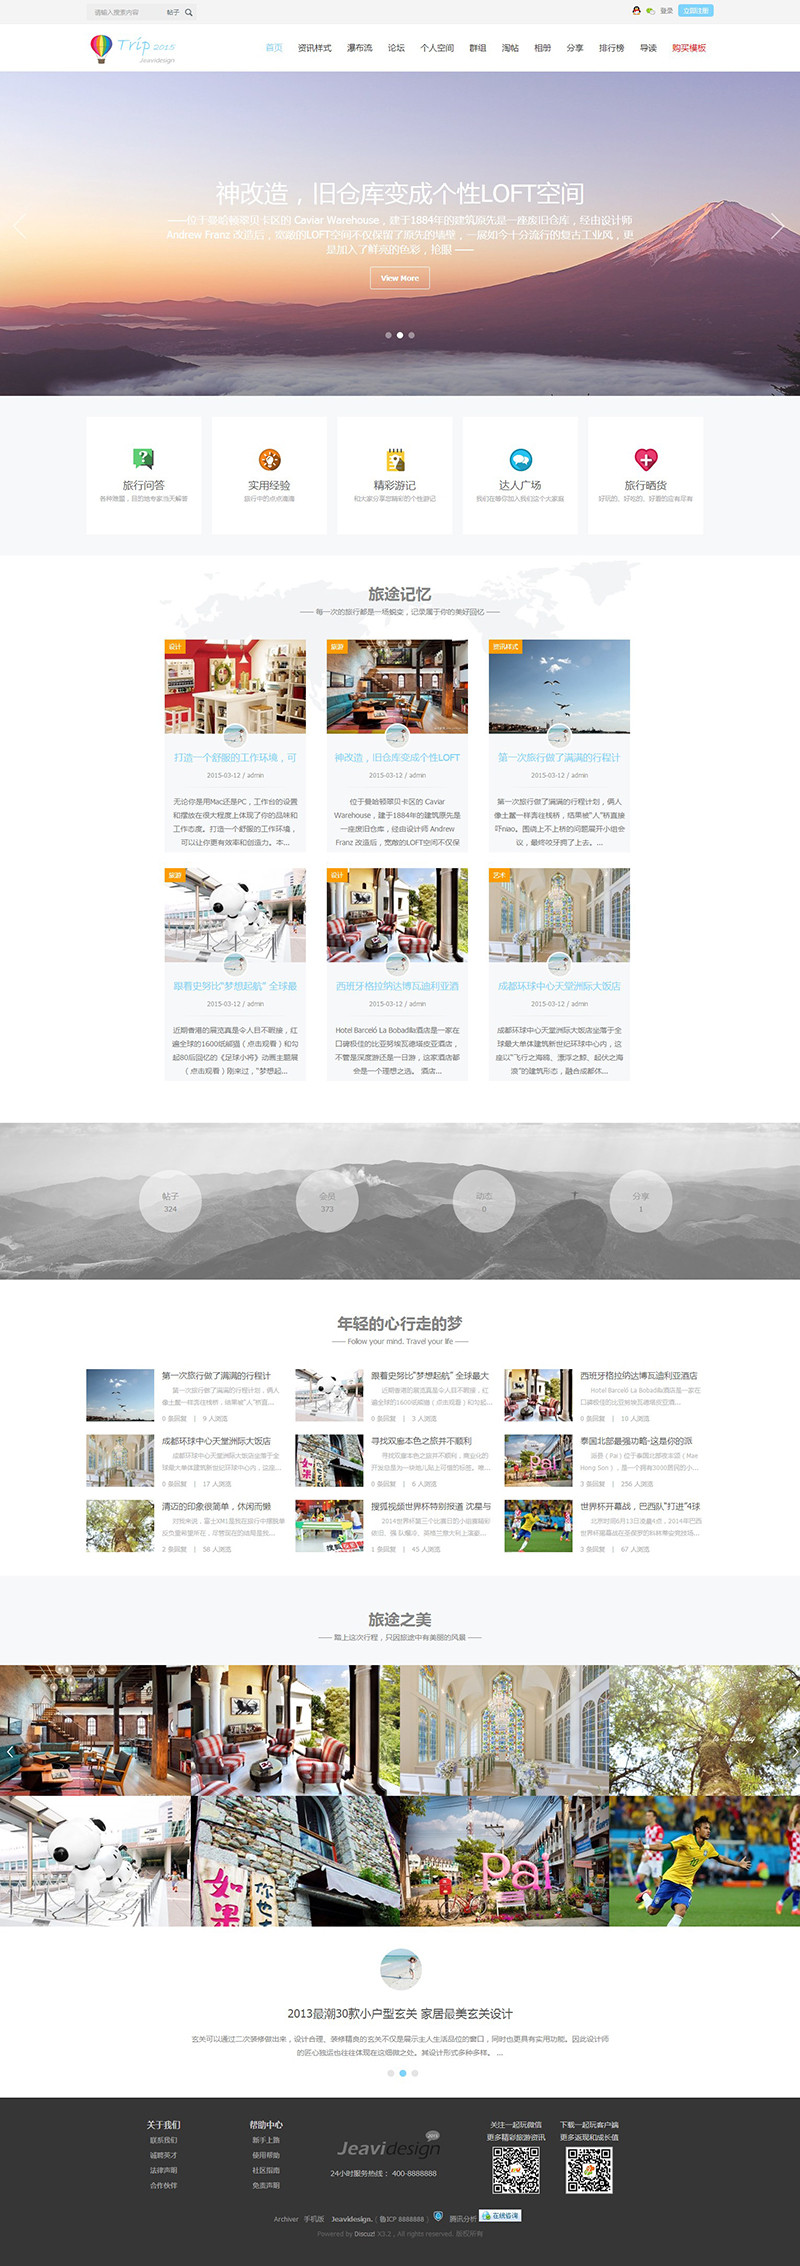 【discuz模板下载】简洁旅游旅行 精品vip商业网站模板 演示